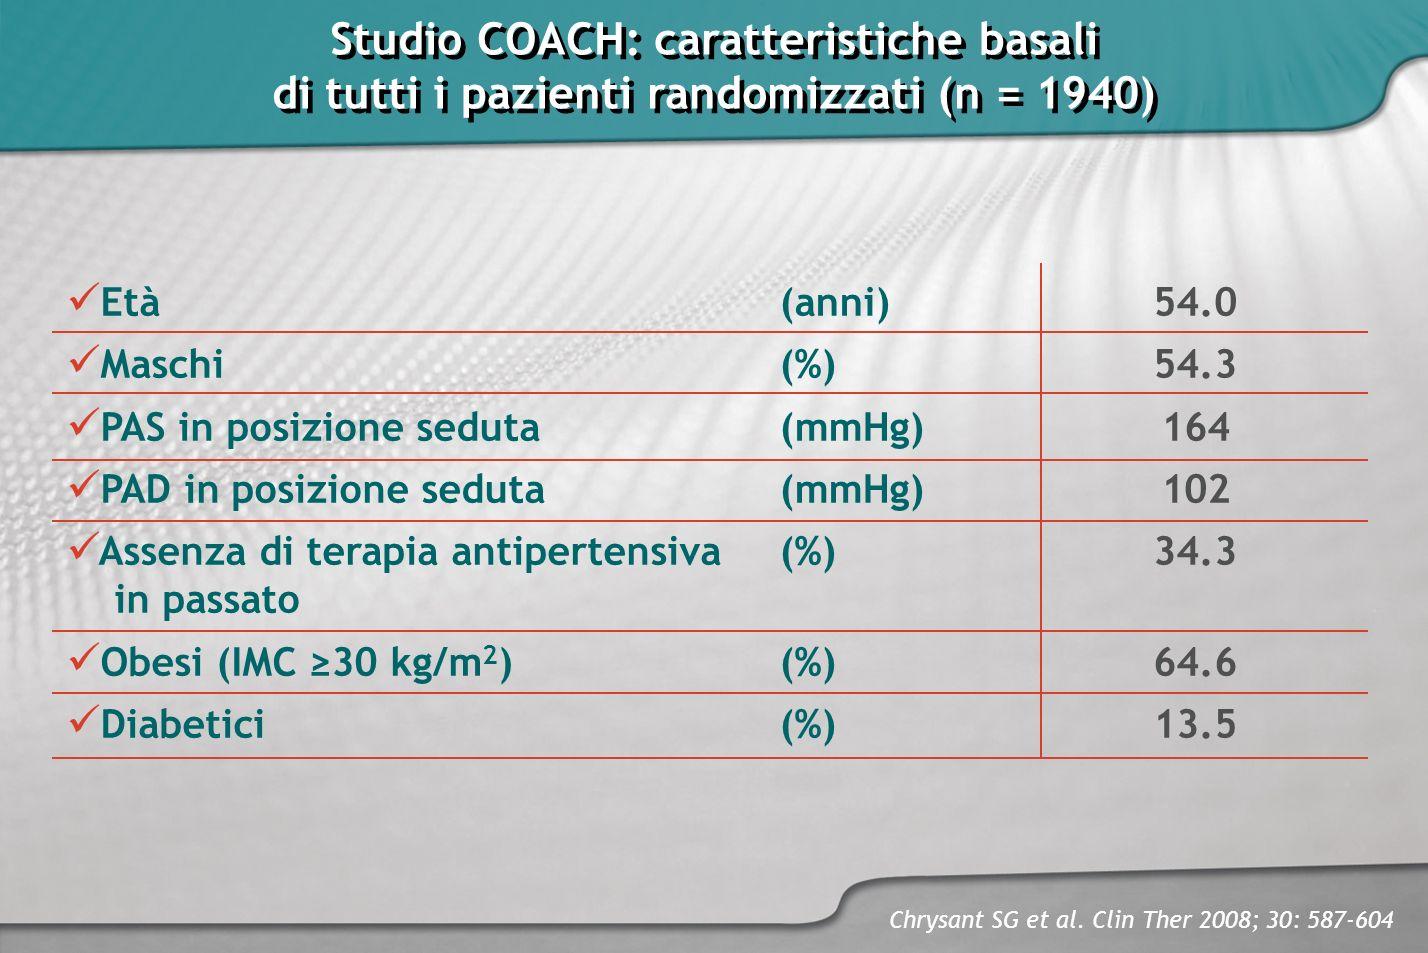 Studio COACH: caratteristiche basali